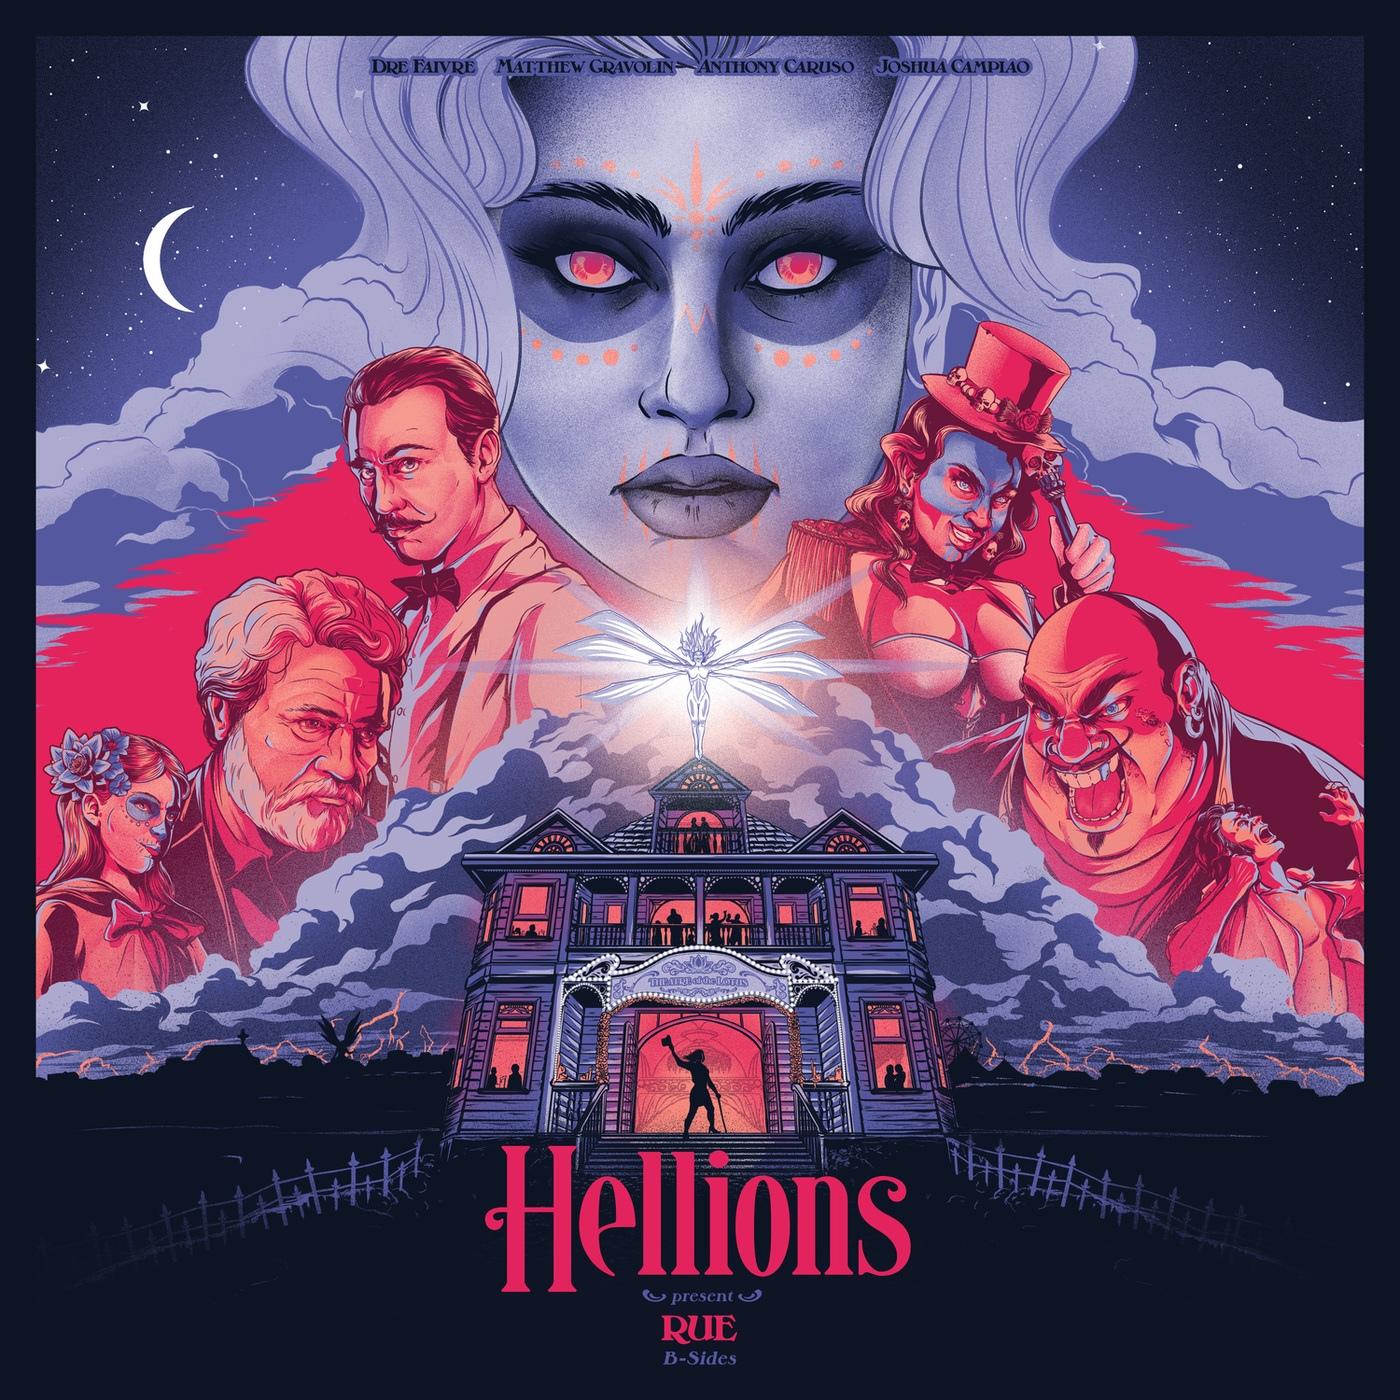 Hellions - Rue B-Sides (2019)